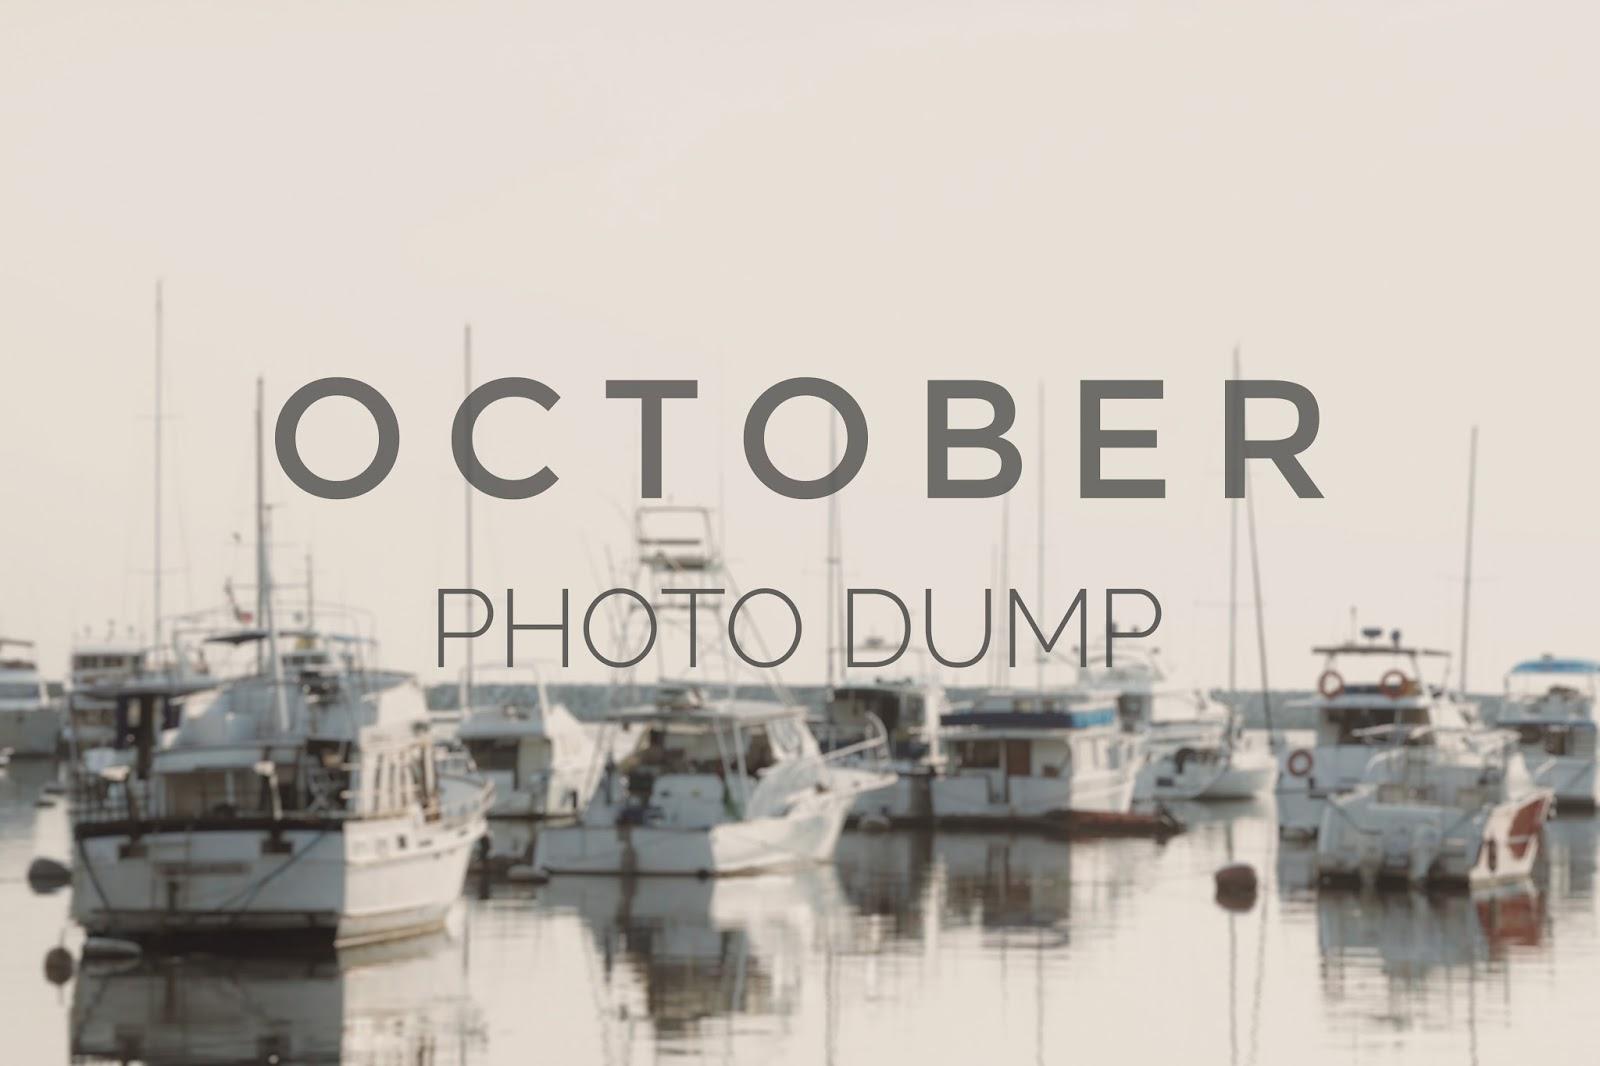 October Photo Dump